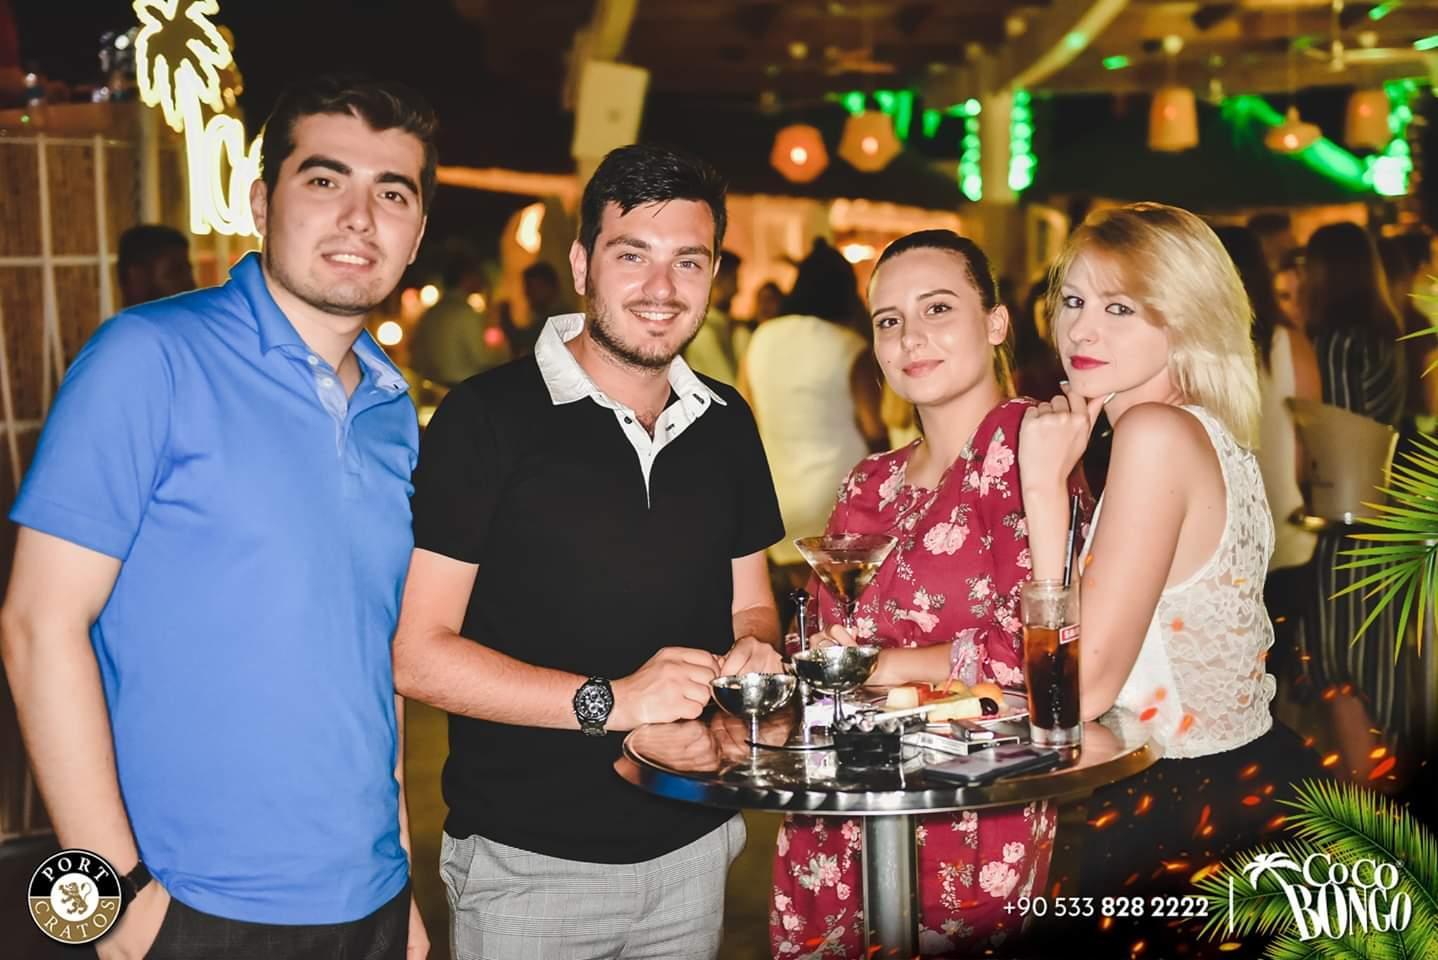 usluge upoznavanja u cipru ayi dating anketa